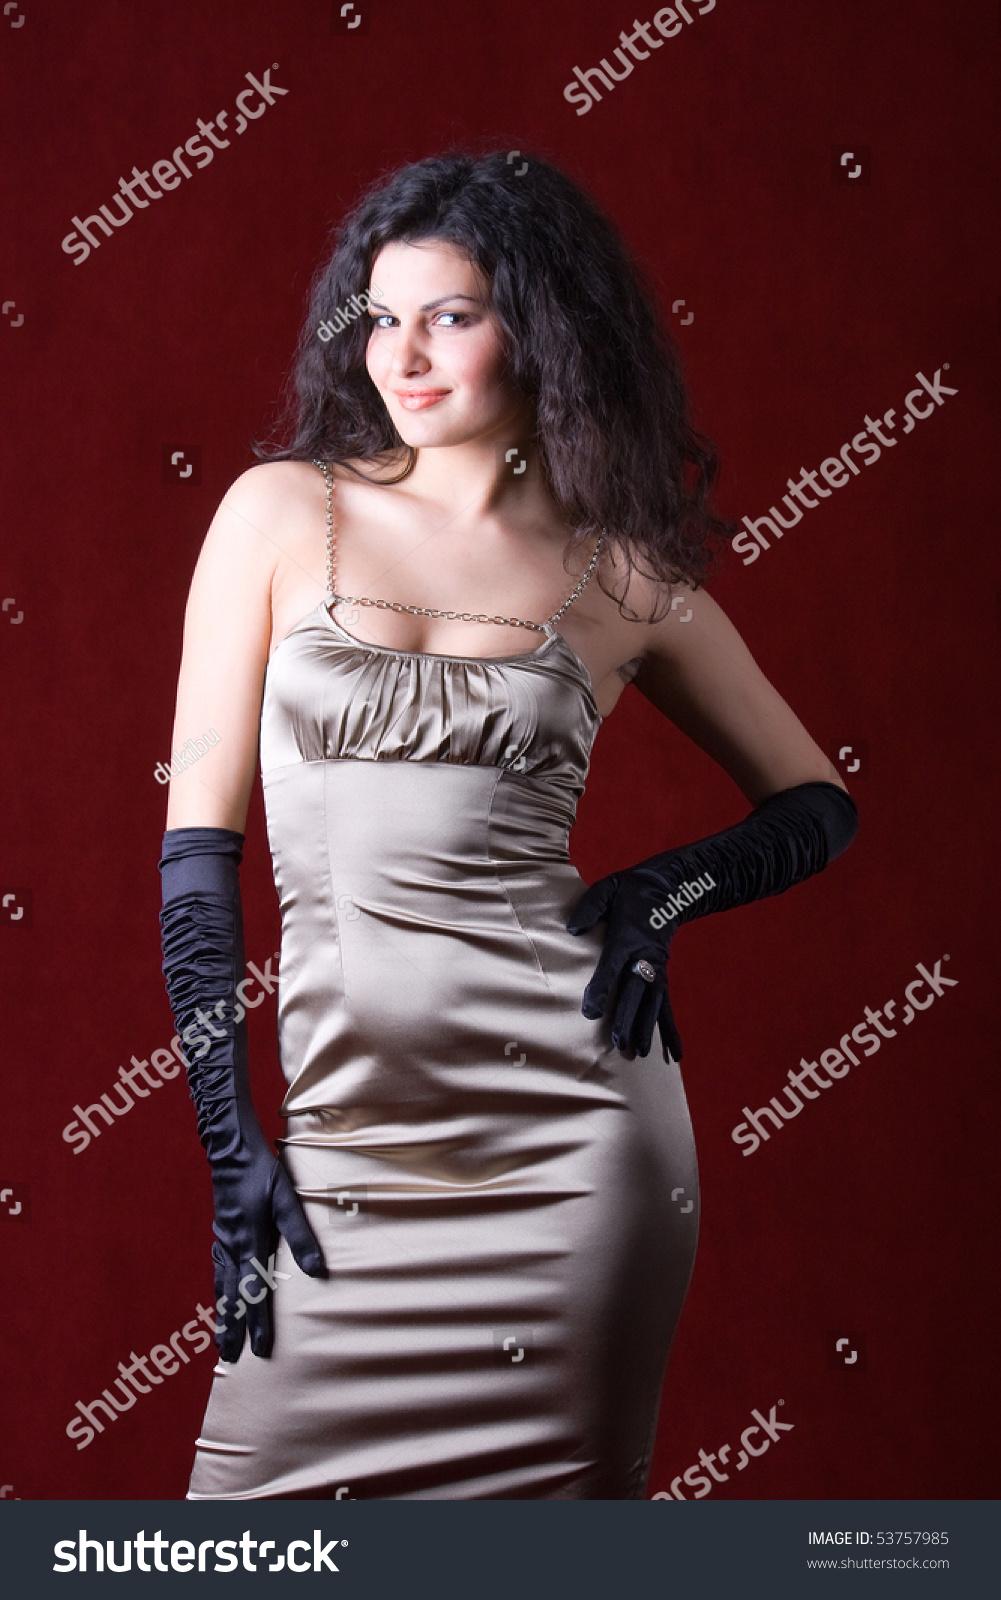 Woman Wearing Satin Dress Black Gloves Stock Photo ...